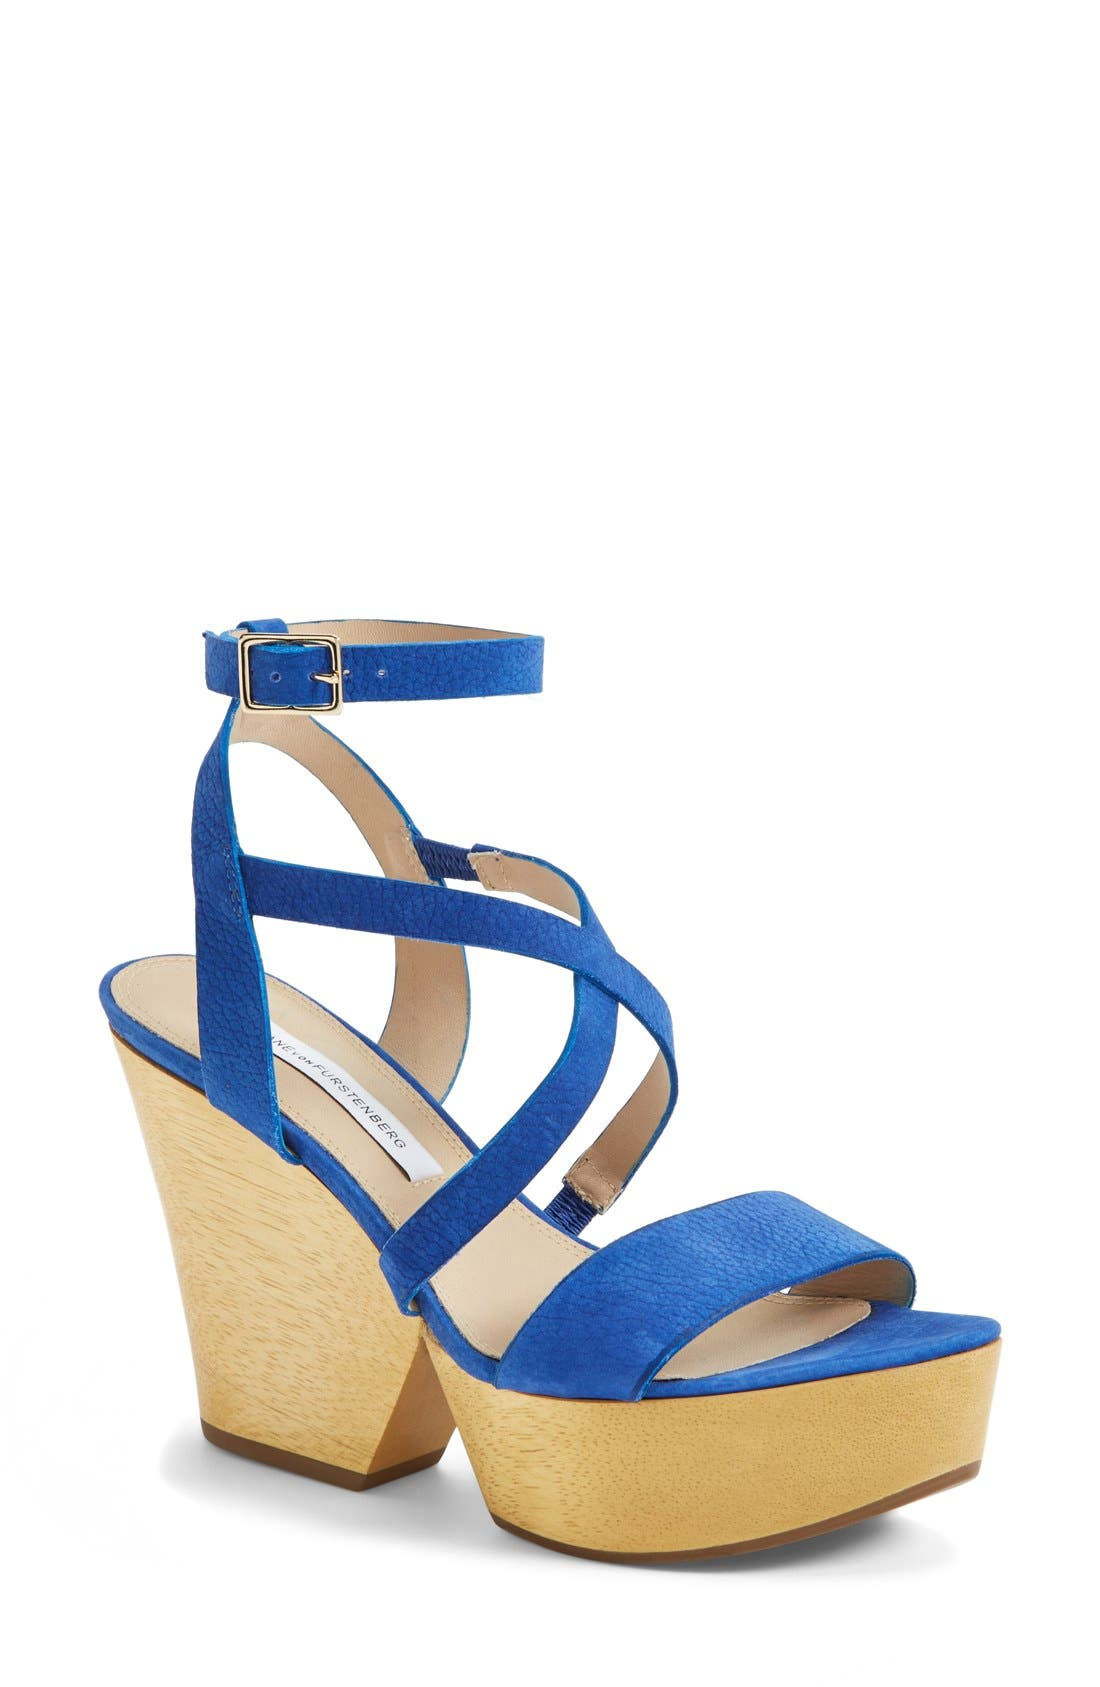 Alternate Image 1 Selected - Diane von Furstenberg 'Lamille' Leather Platform Wedge Sandal (Women)